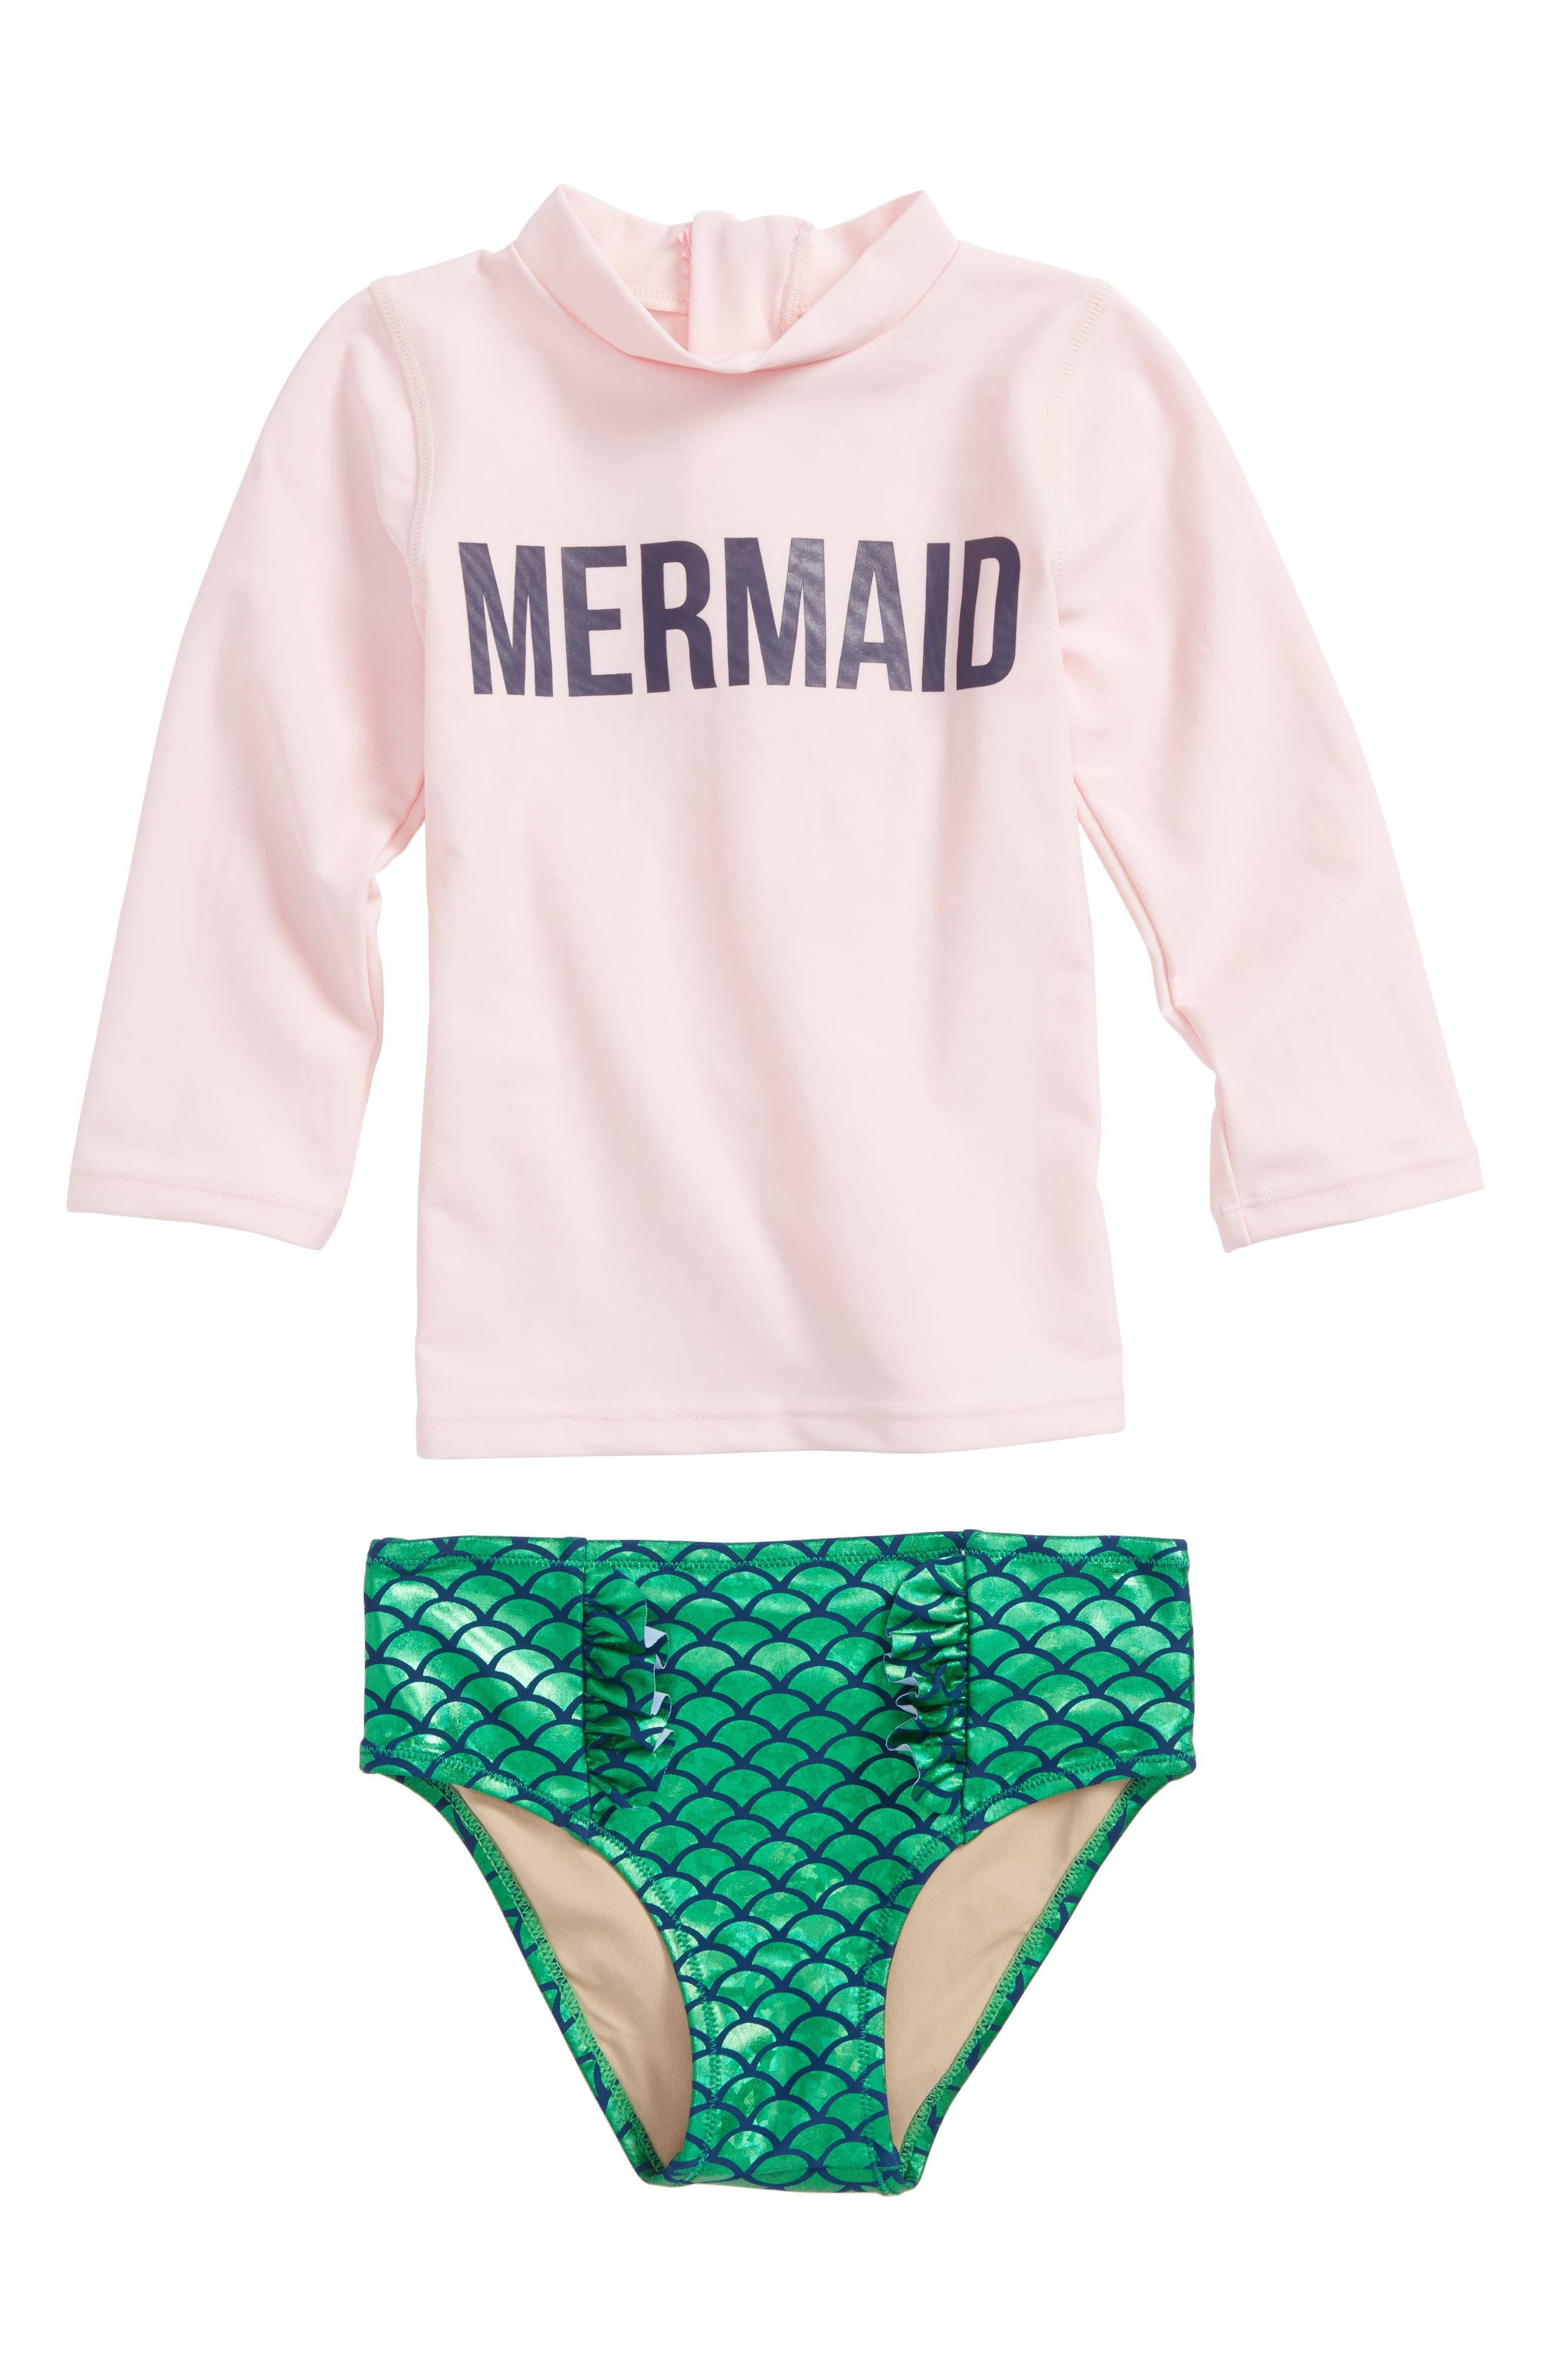 Magic Mermaid Two-Piece Rashguard Swimsuit,                             Main thumbnail 1, color,                             650